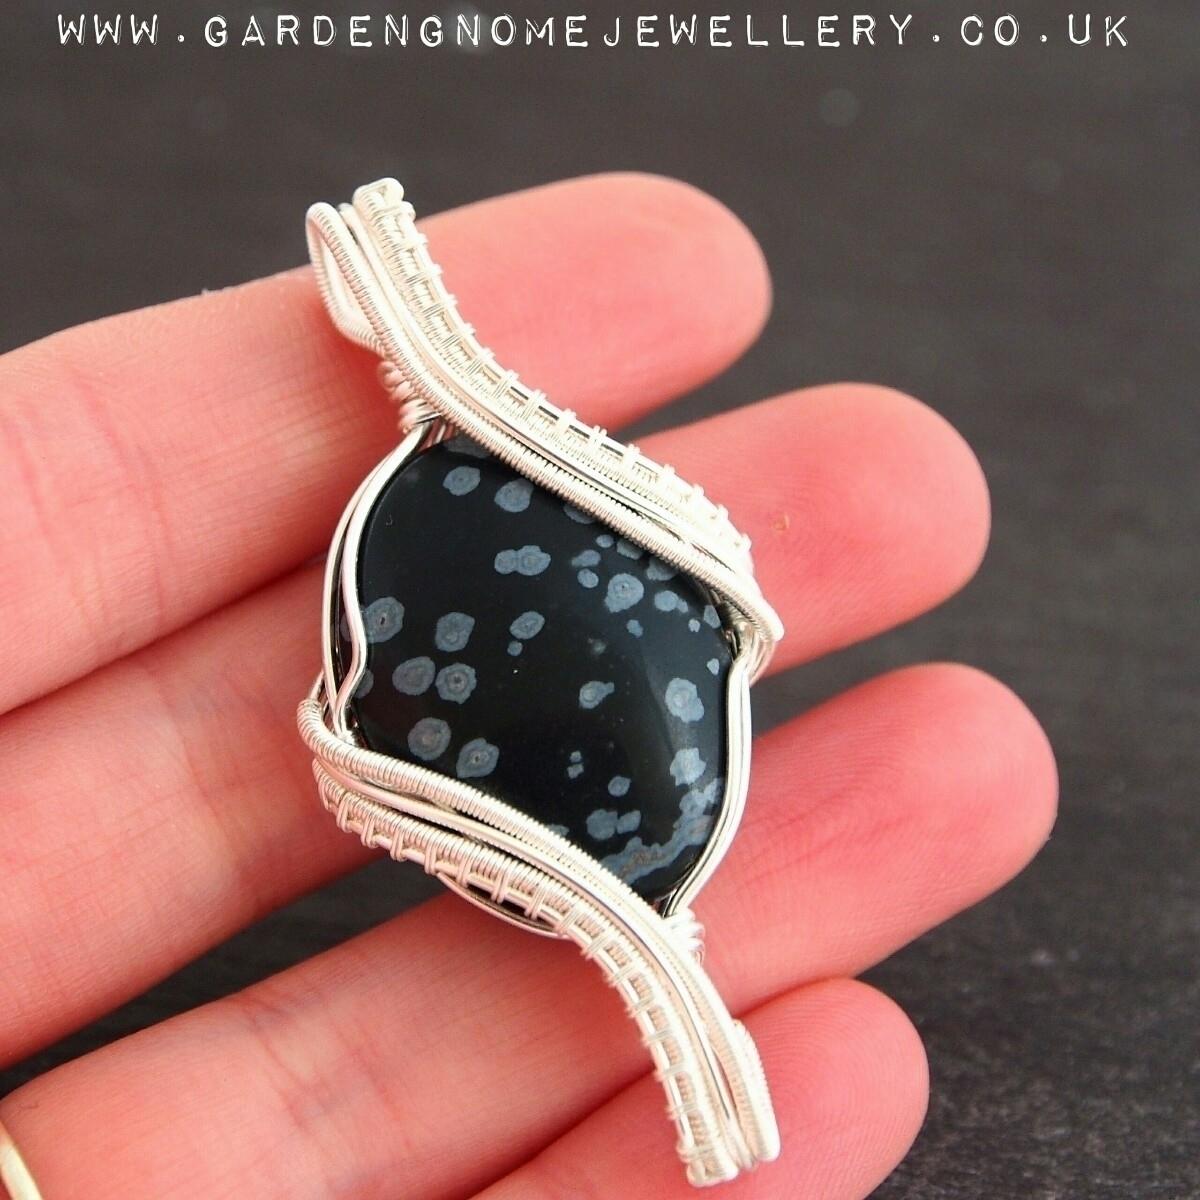 lovely piece shop, snowflake ob - gardengnomejewellery | ello